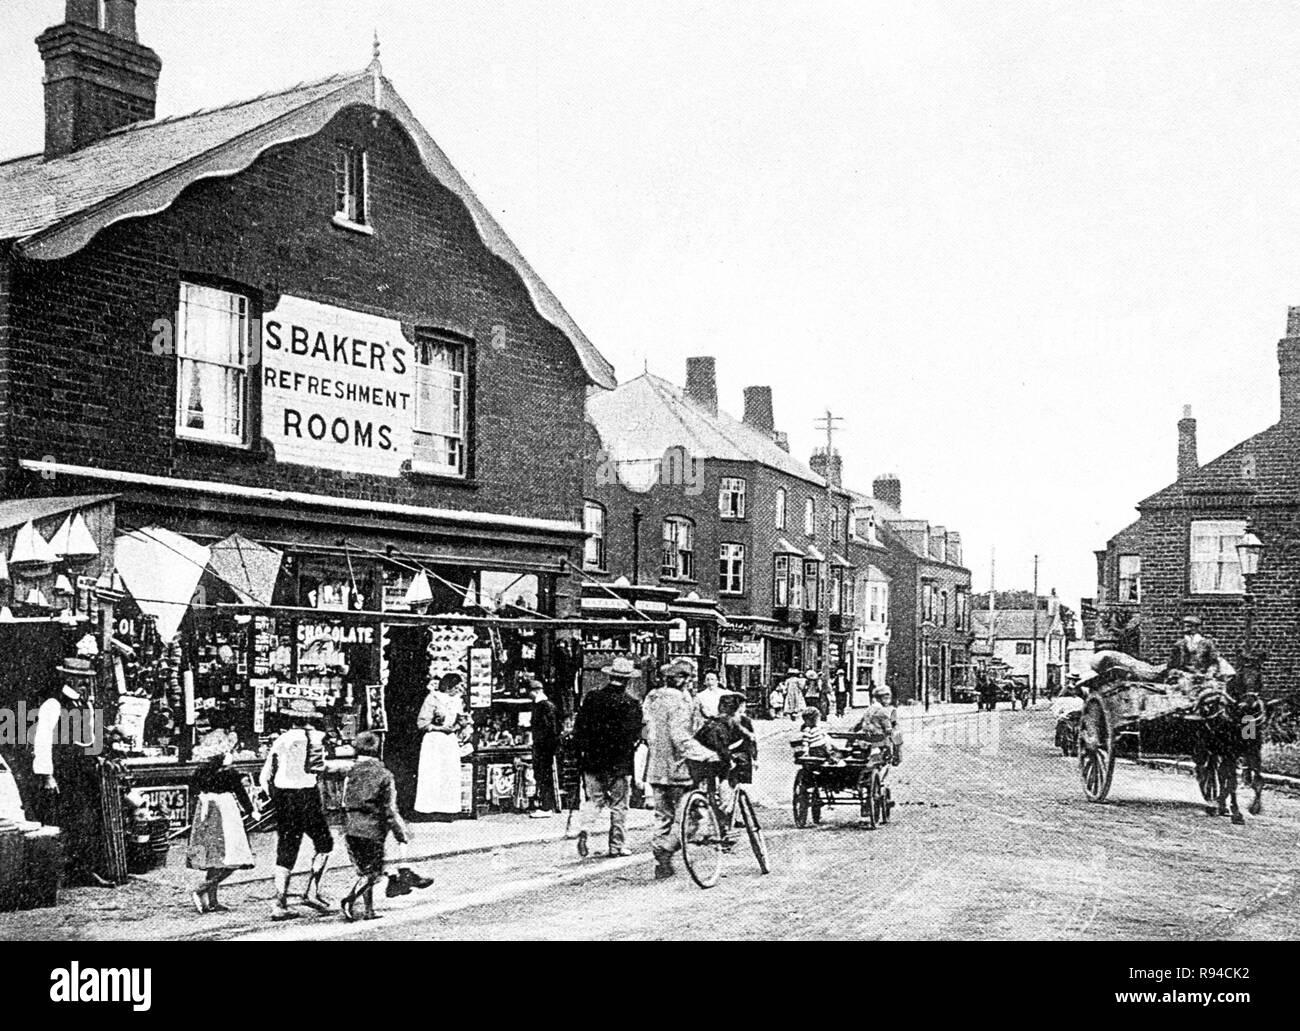 High Street, Sutton on Sea - Stock Image